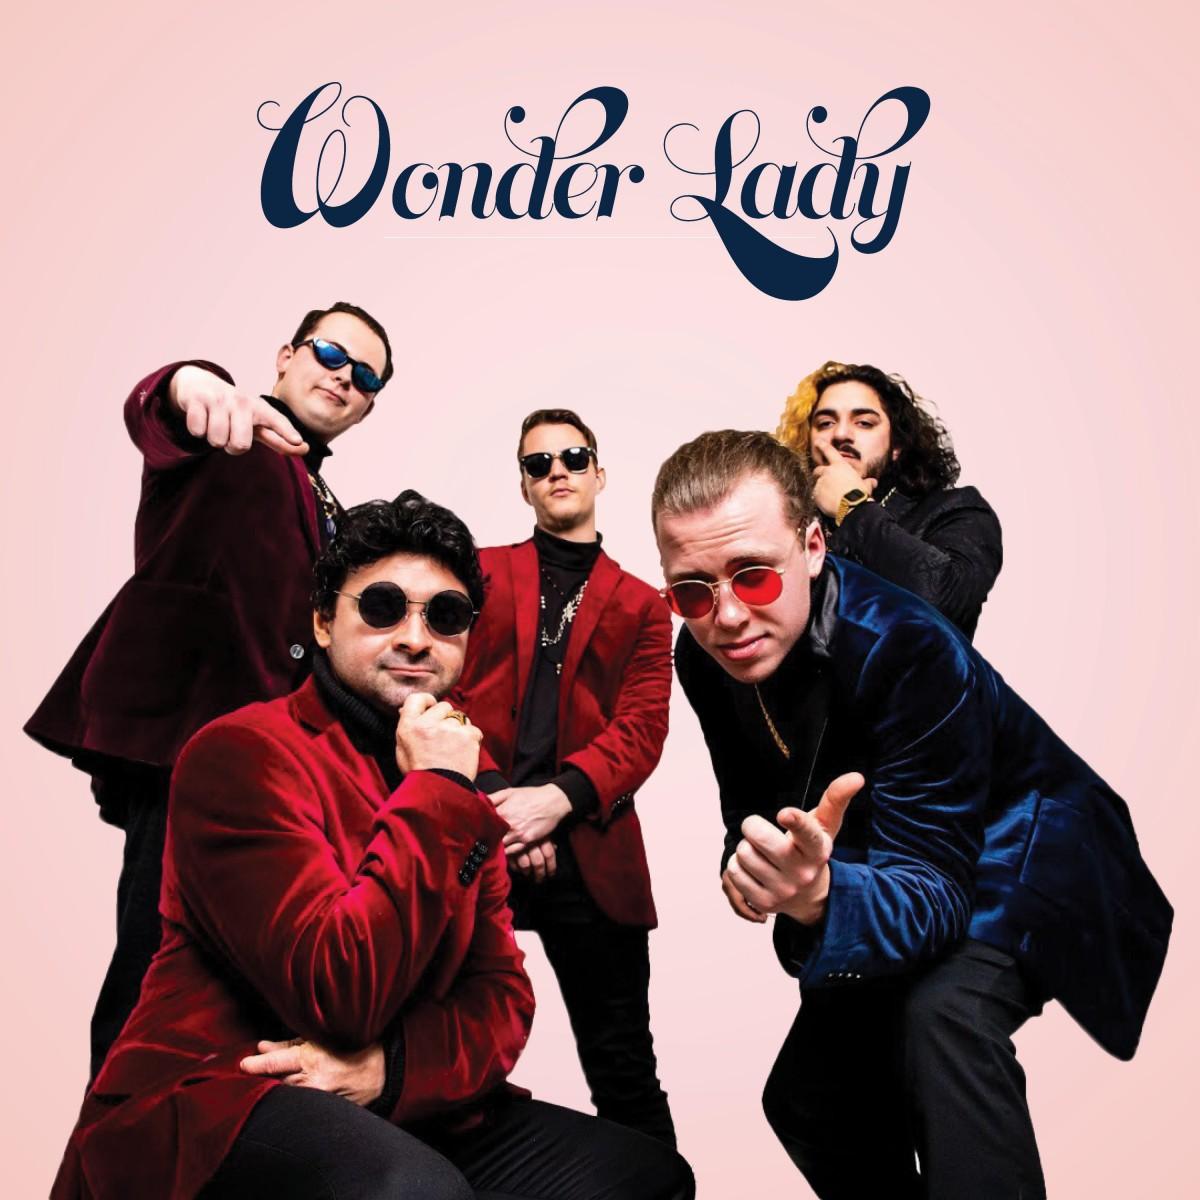 Album Review: Tales of Joy, Wonder Lady